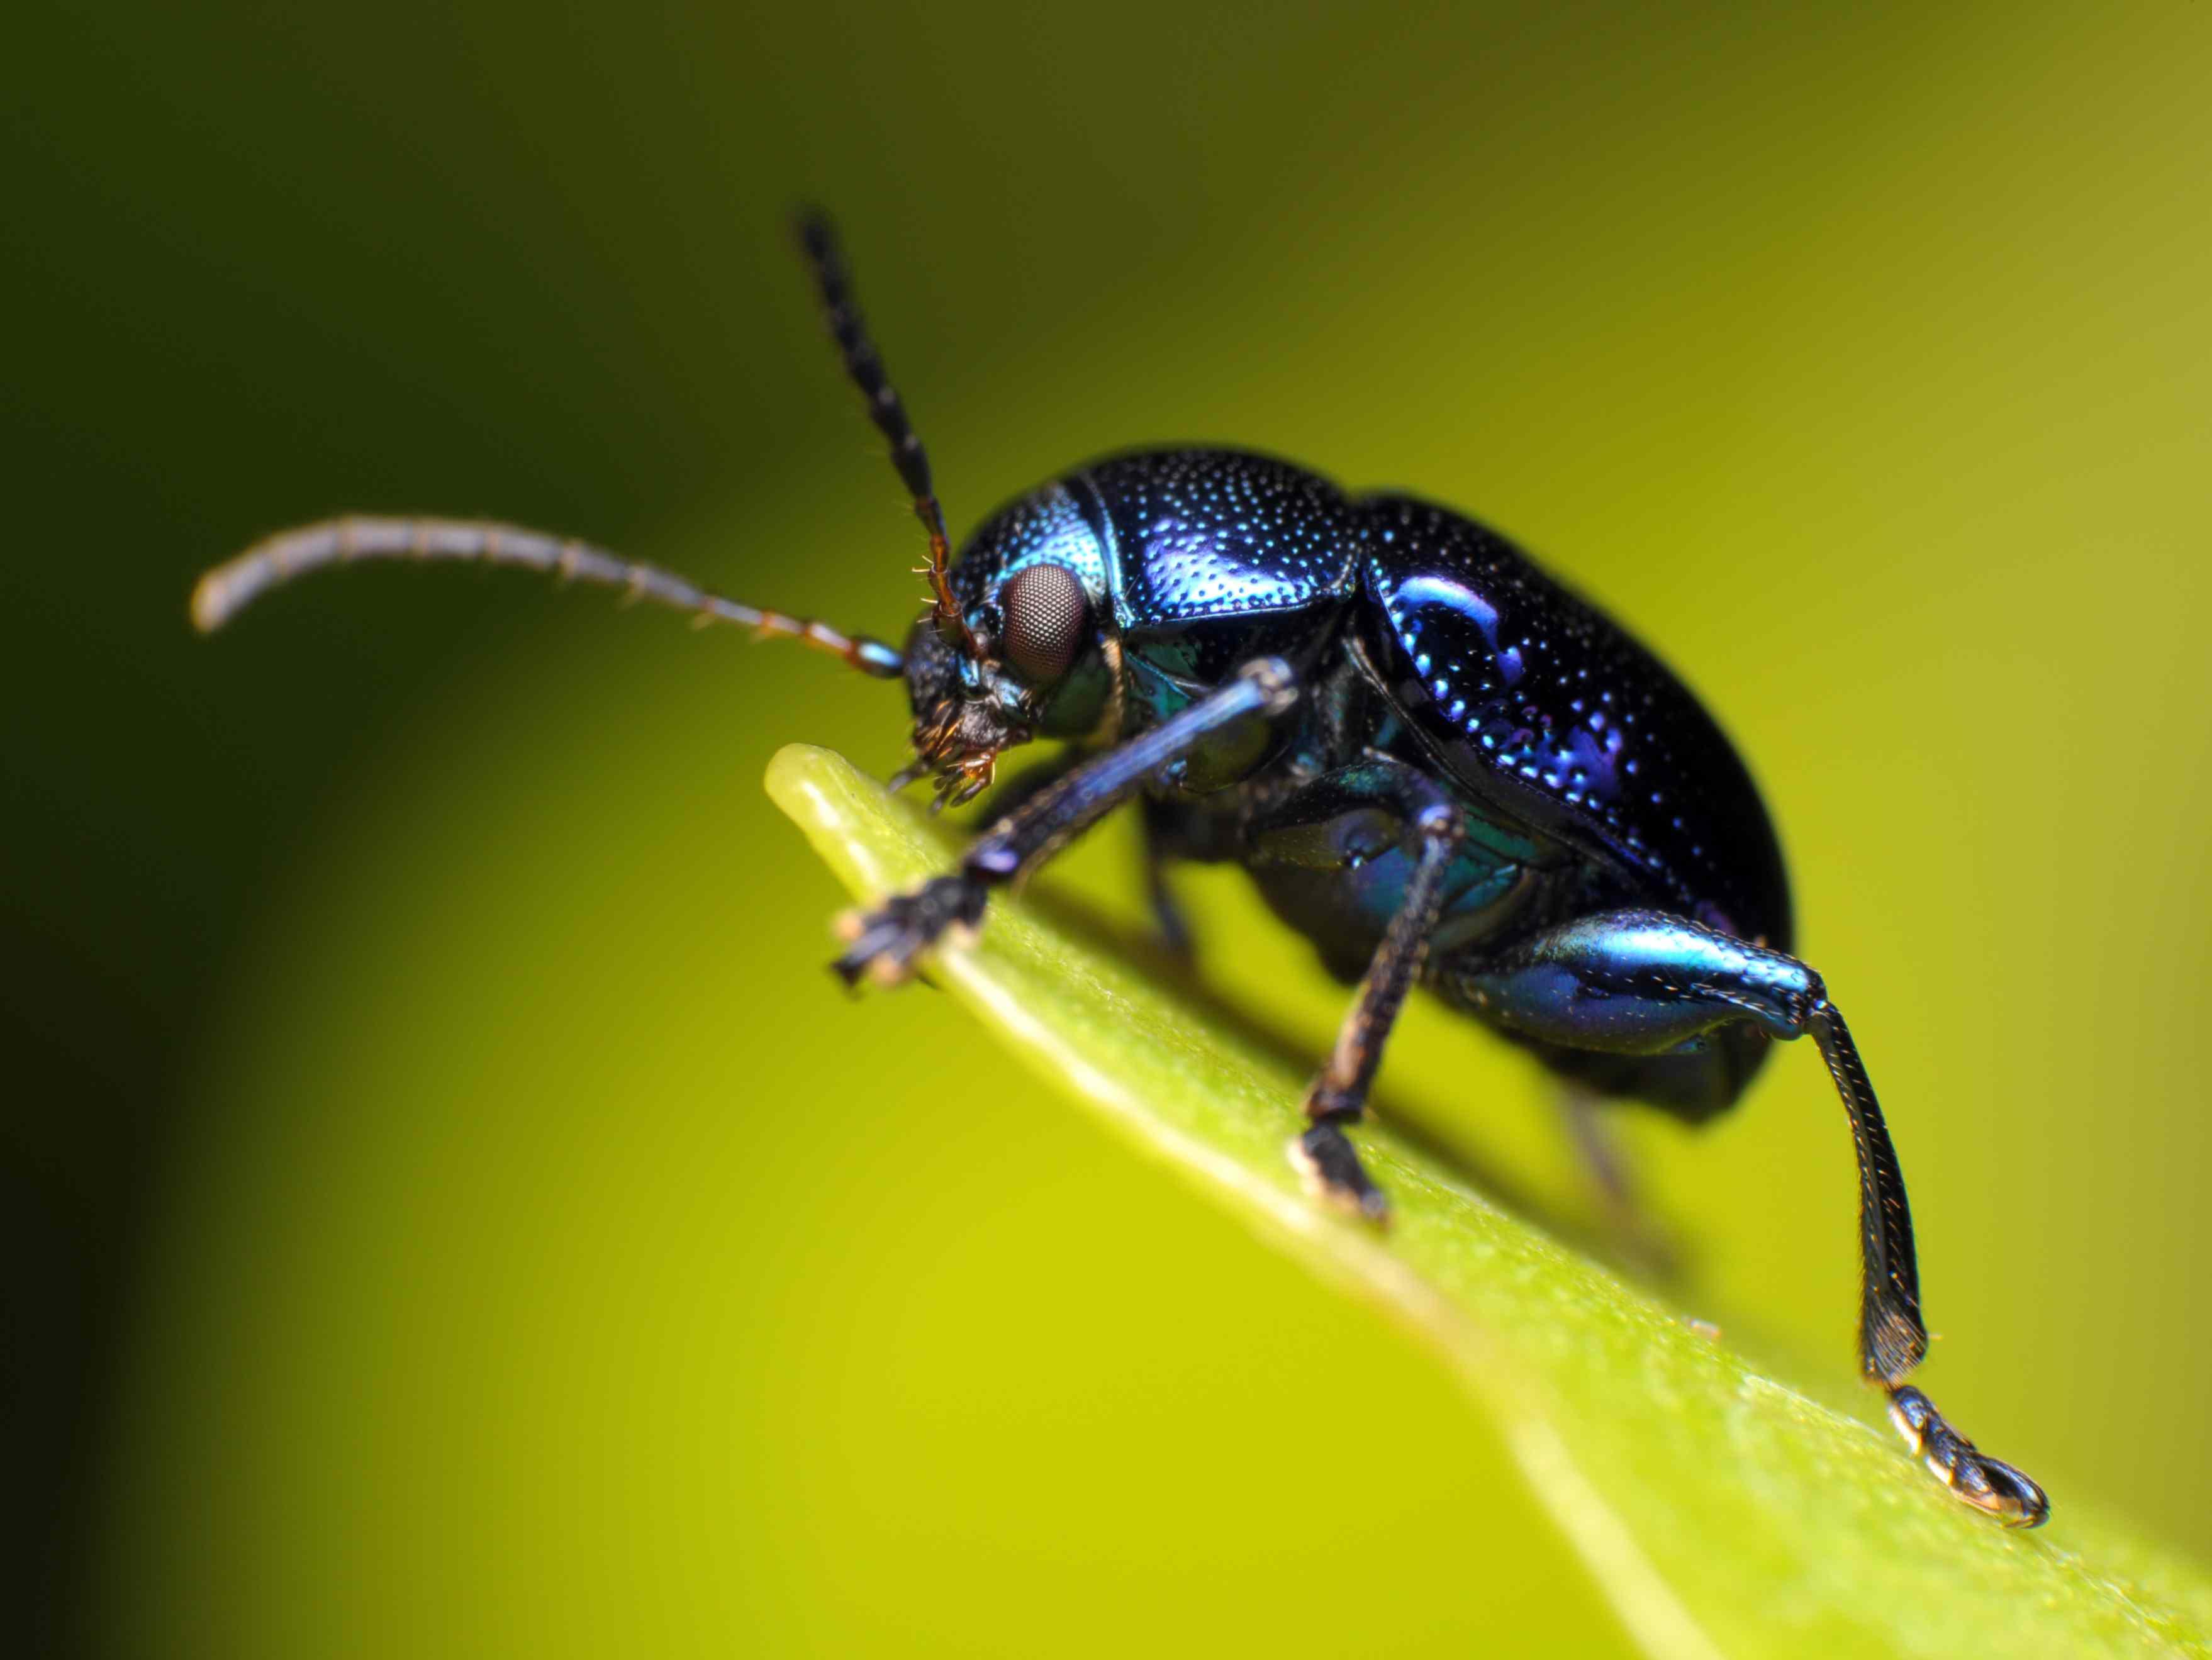 Blue milkweed beetle.